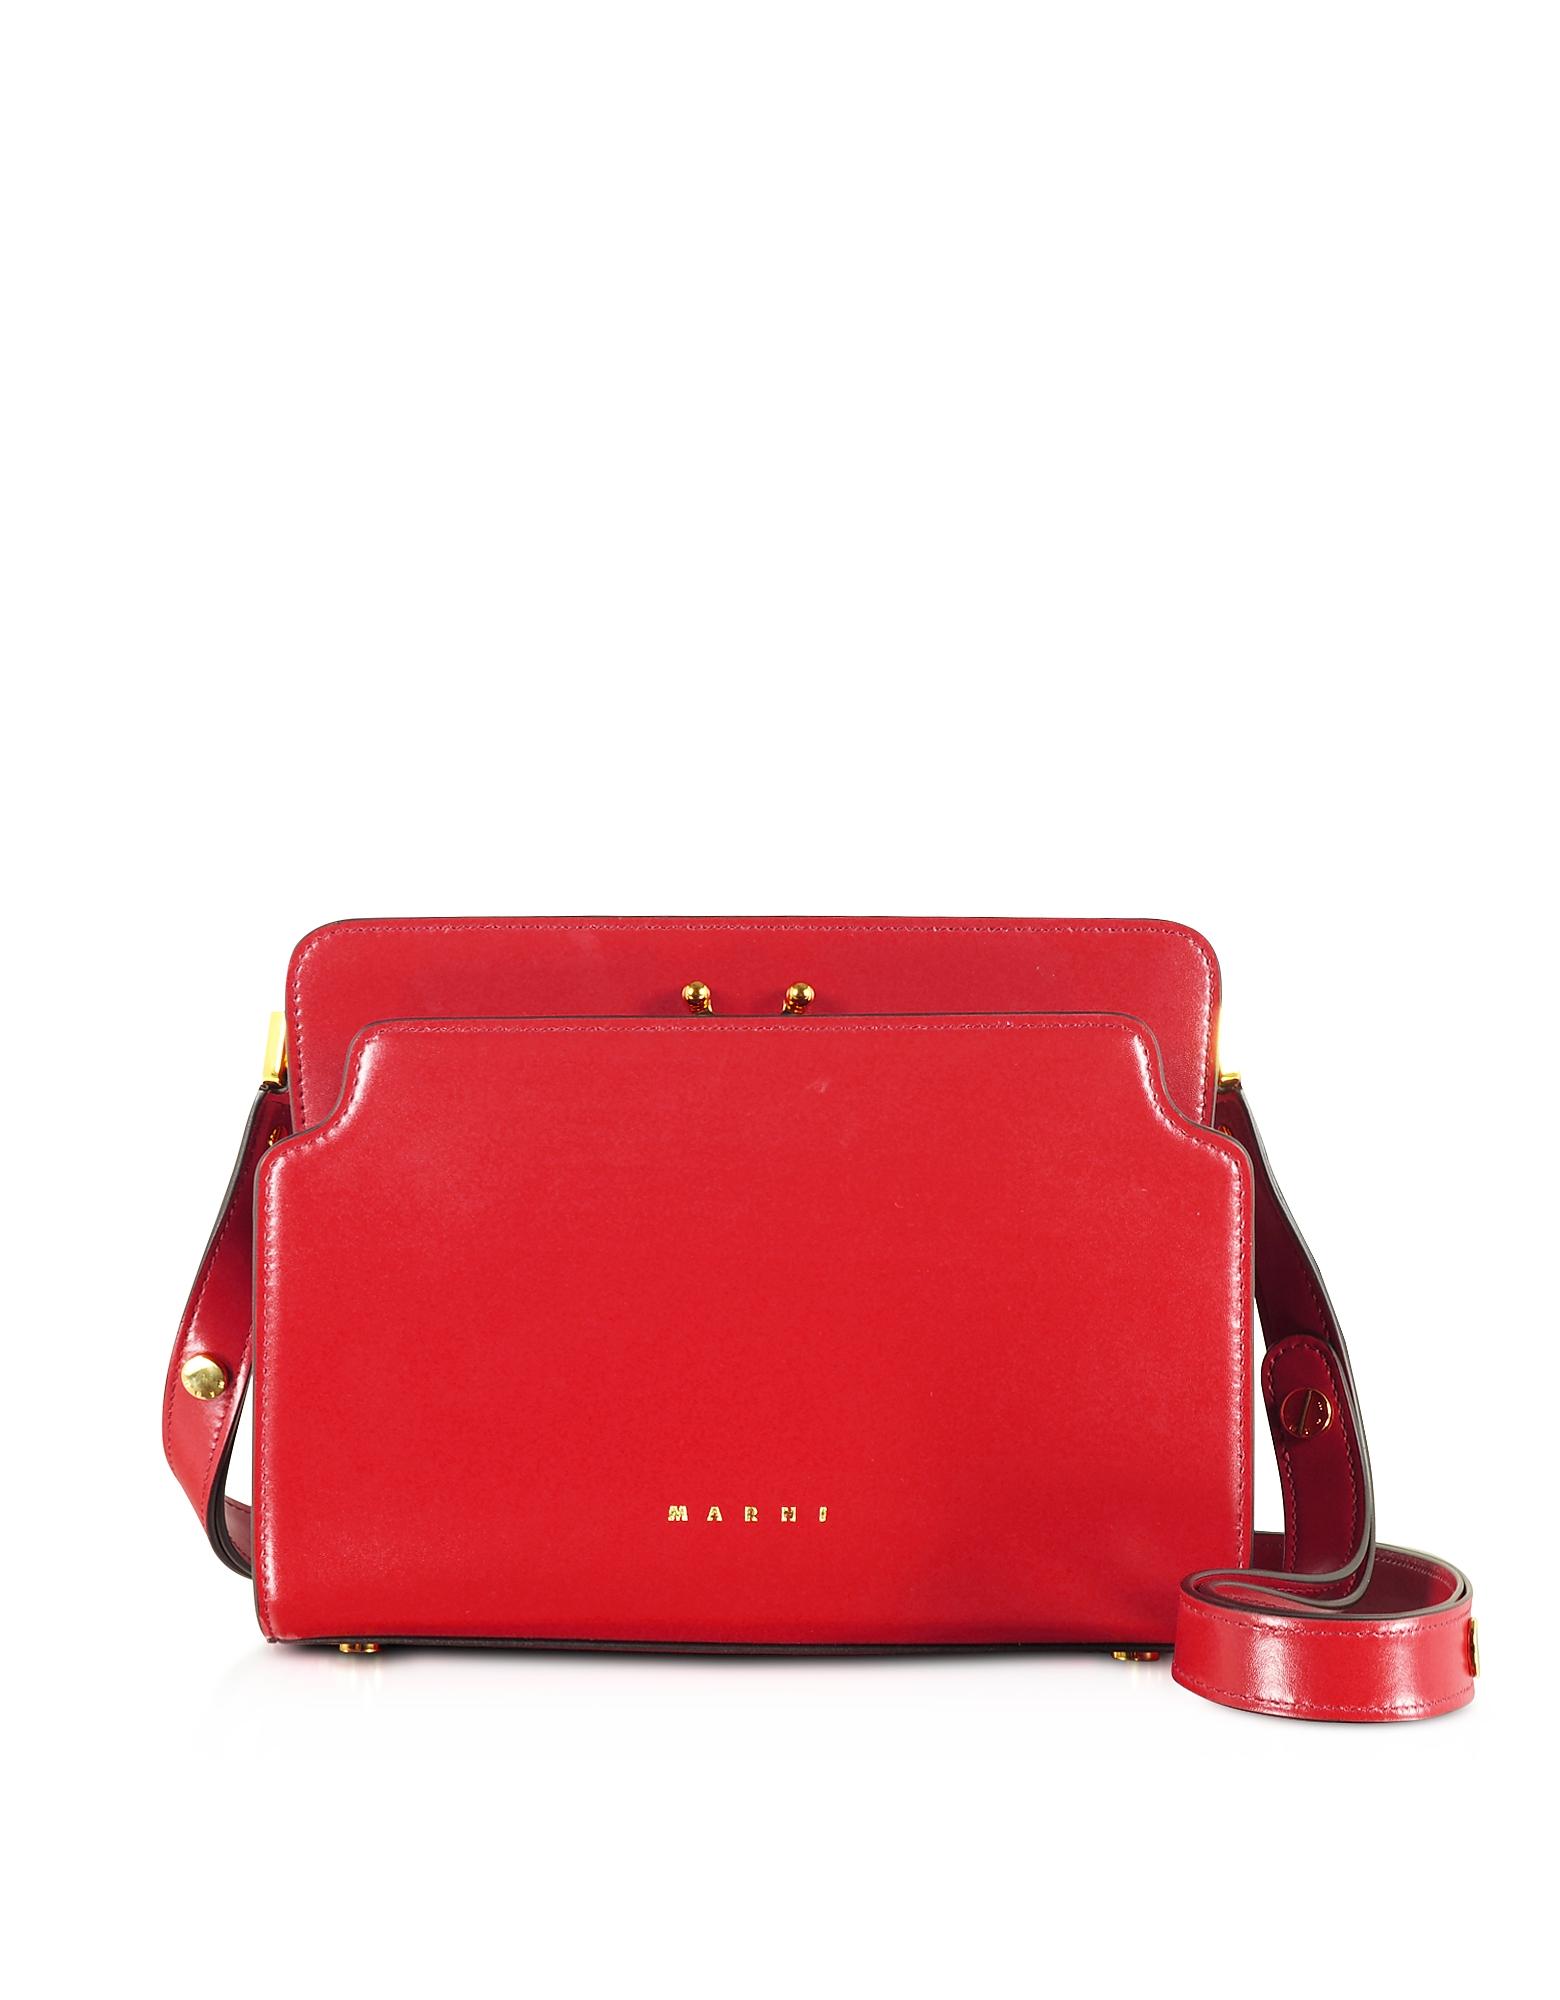 Marni Designer Handbags, Trunk Reverse Nappa Calf Leather Crossbody Bag